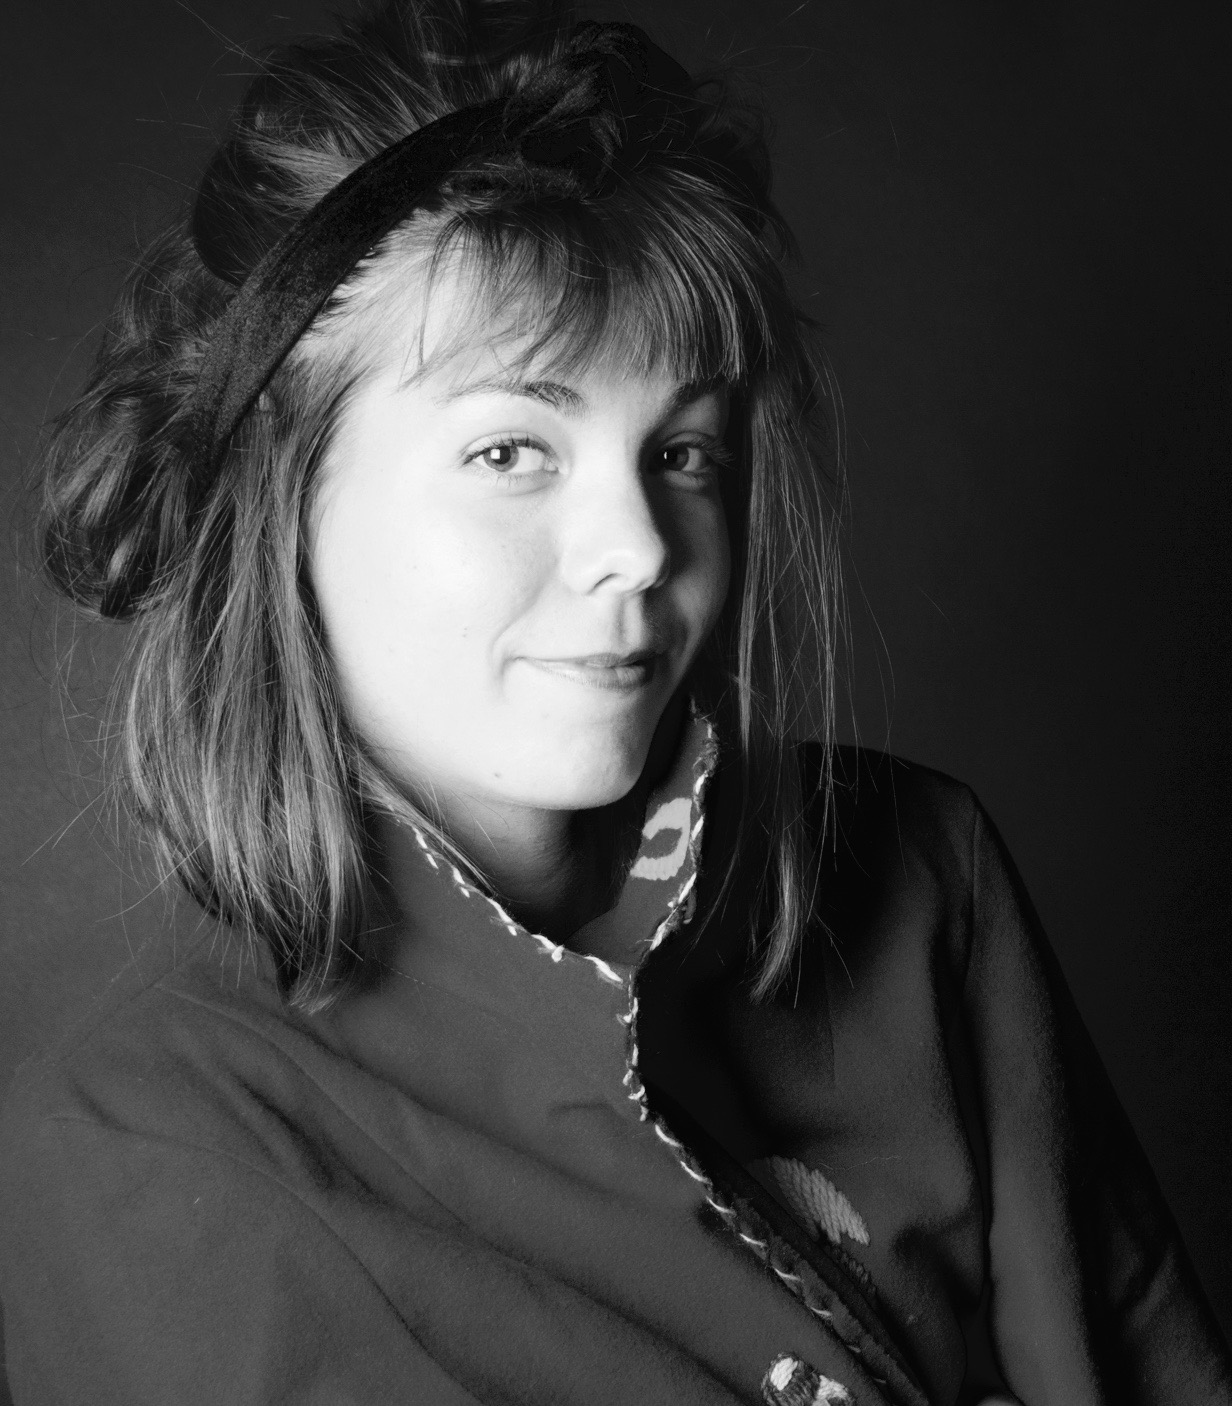 Alicia PACKER